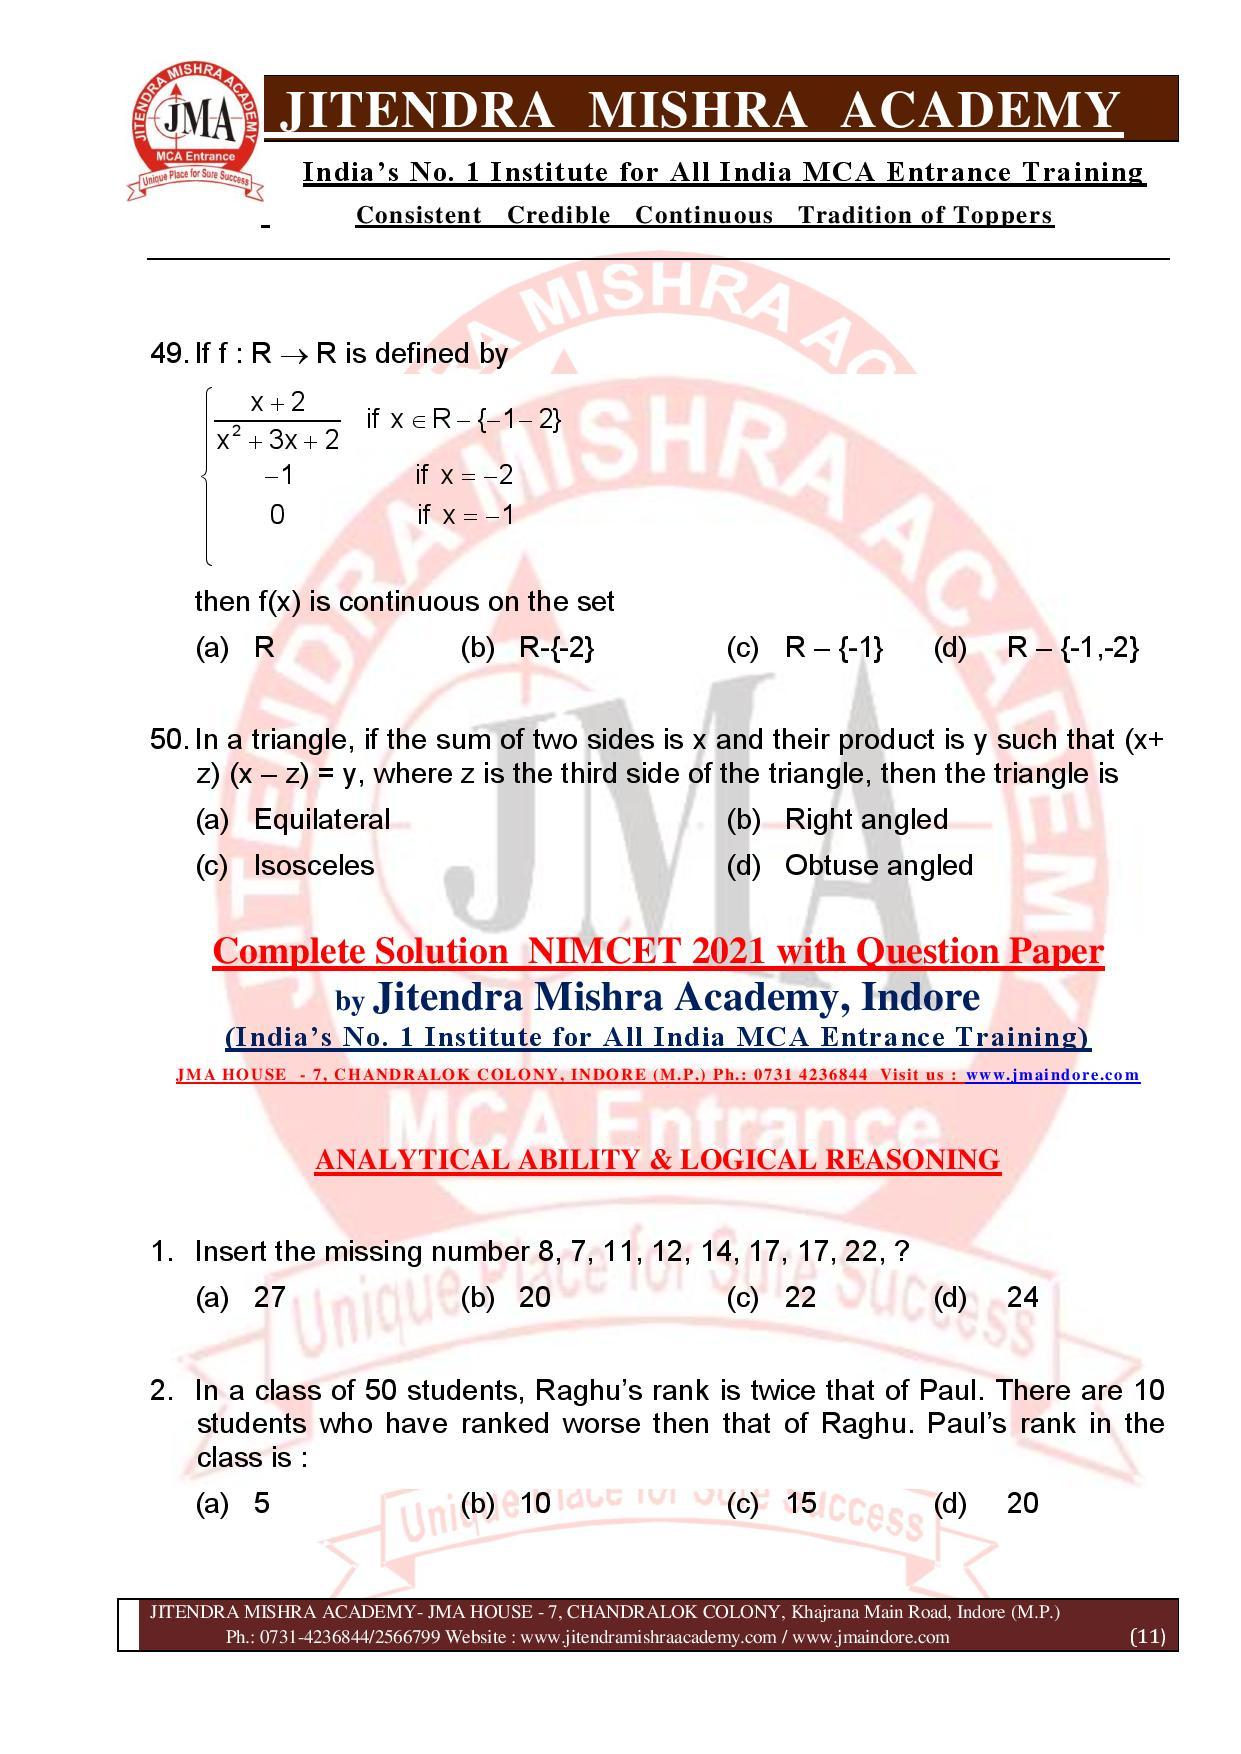 NIMCET 2021 QUESTION PAPER (F)-page-011